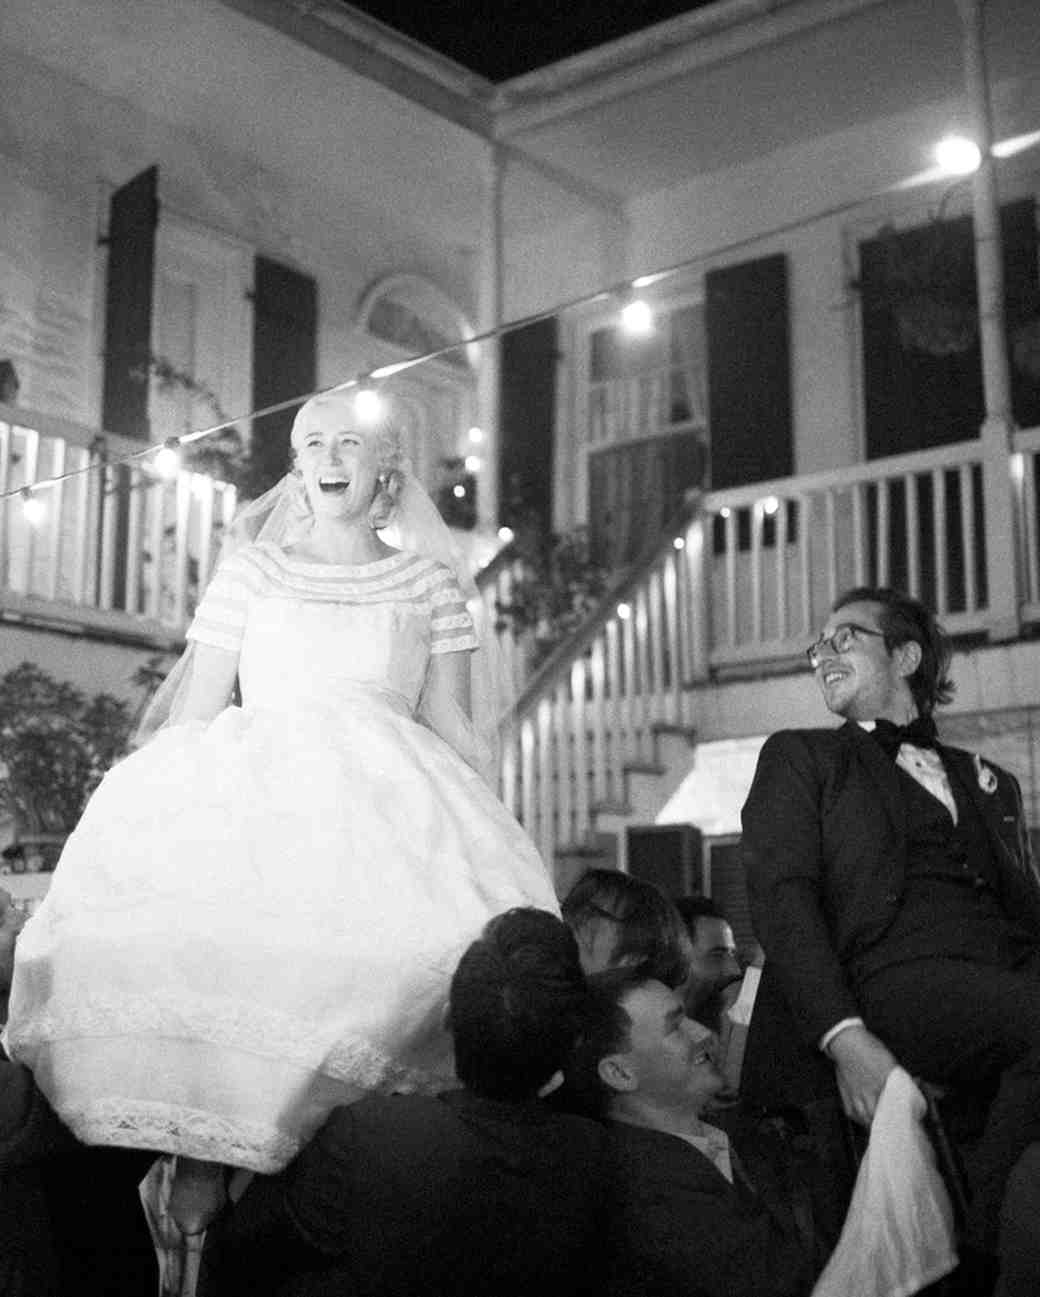 jessica-graham-wedding-hora-0098-s112171-0915.jpg